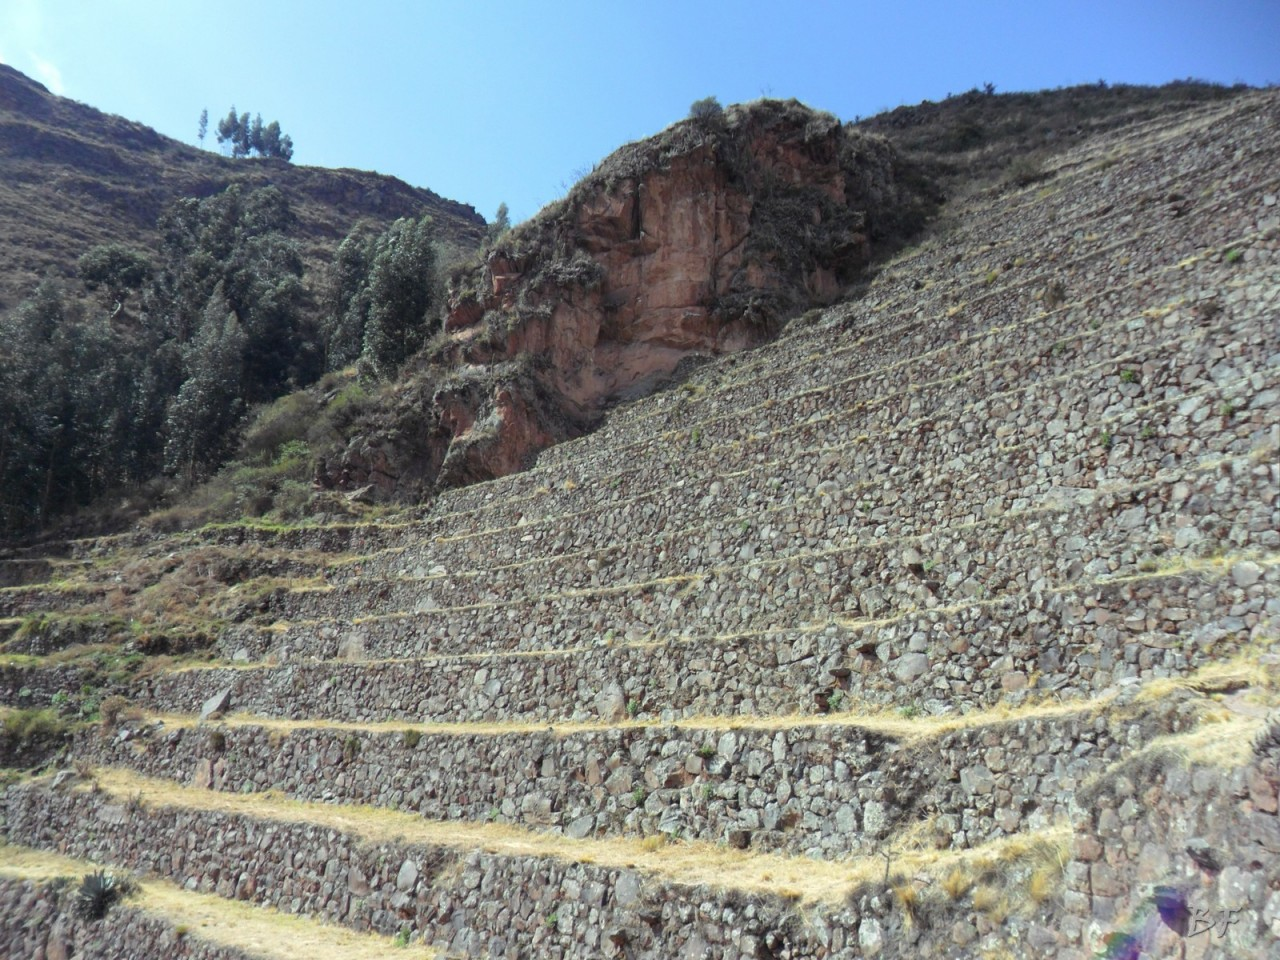 Mura-Poligonali-Megaliti-Altari-Rupestri-Pisac-Cusco-Perù-2